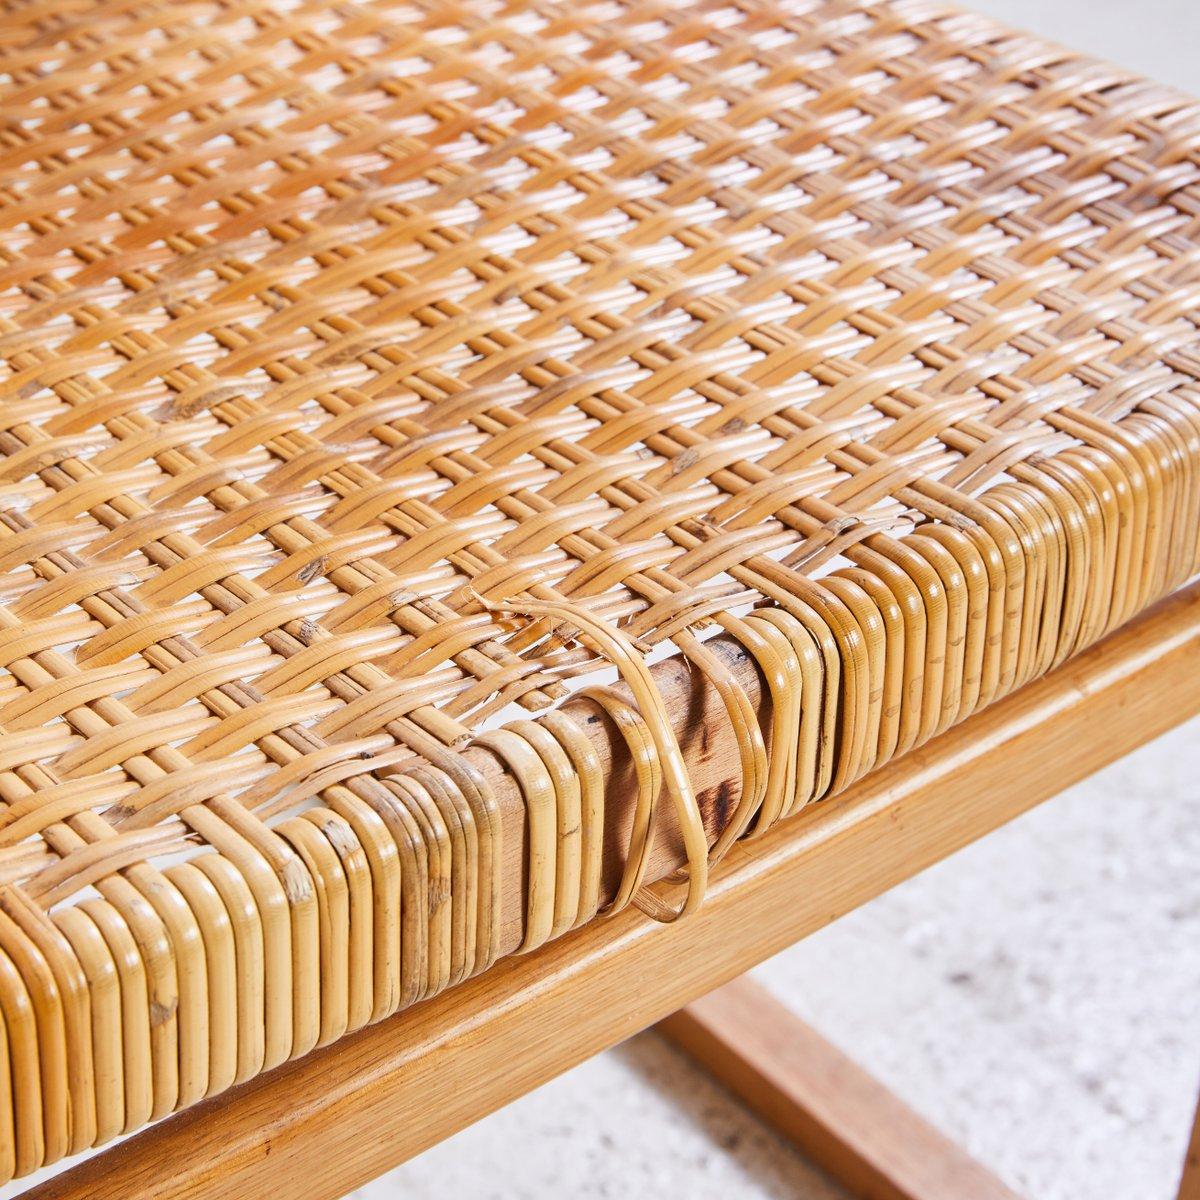 modell bm62 armlehnstuhl aus weiden korbgeflecht von b rge mogensen f r p lauritsen sons. Black Bedroom Furniture Sets. Home Design Ideas